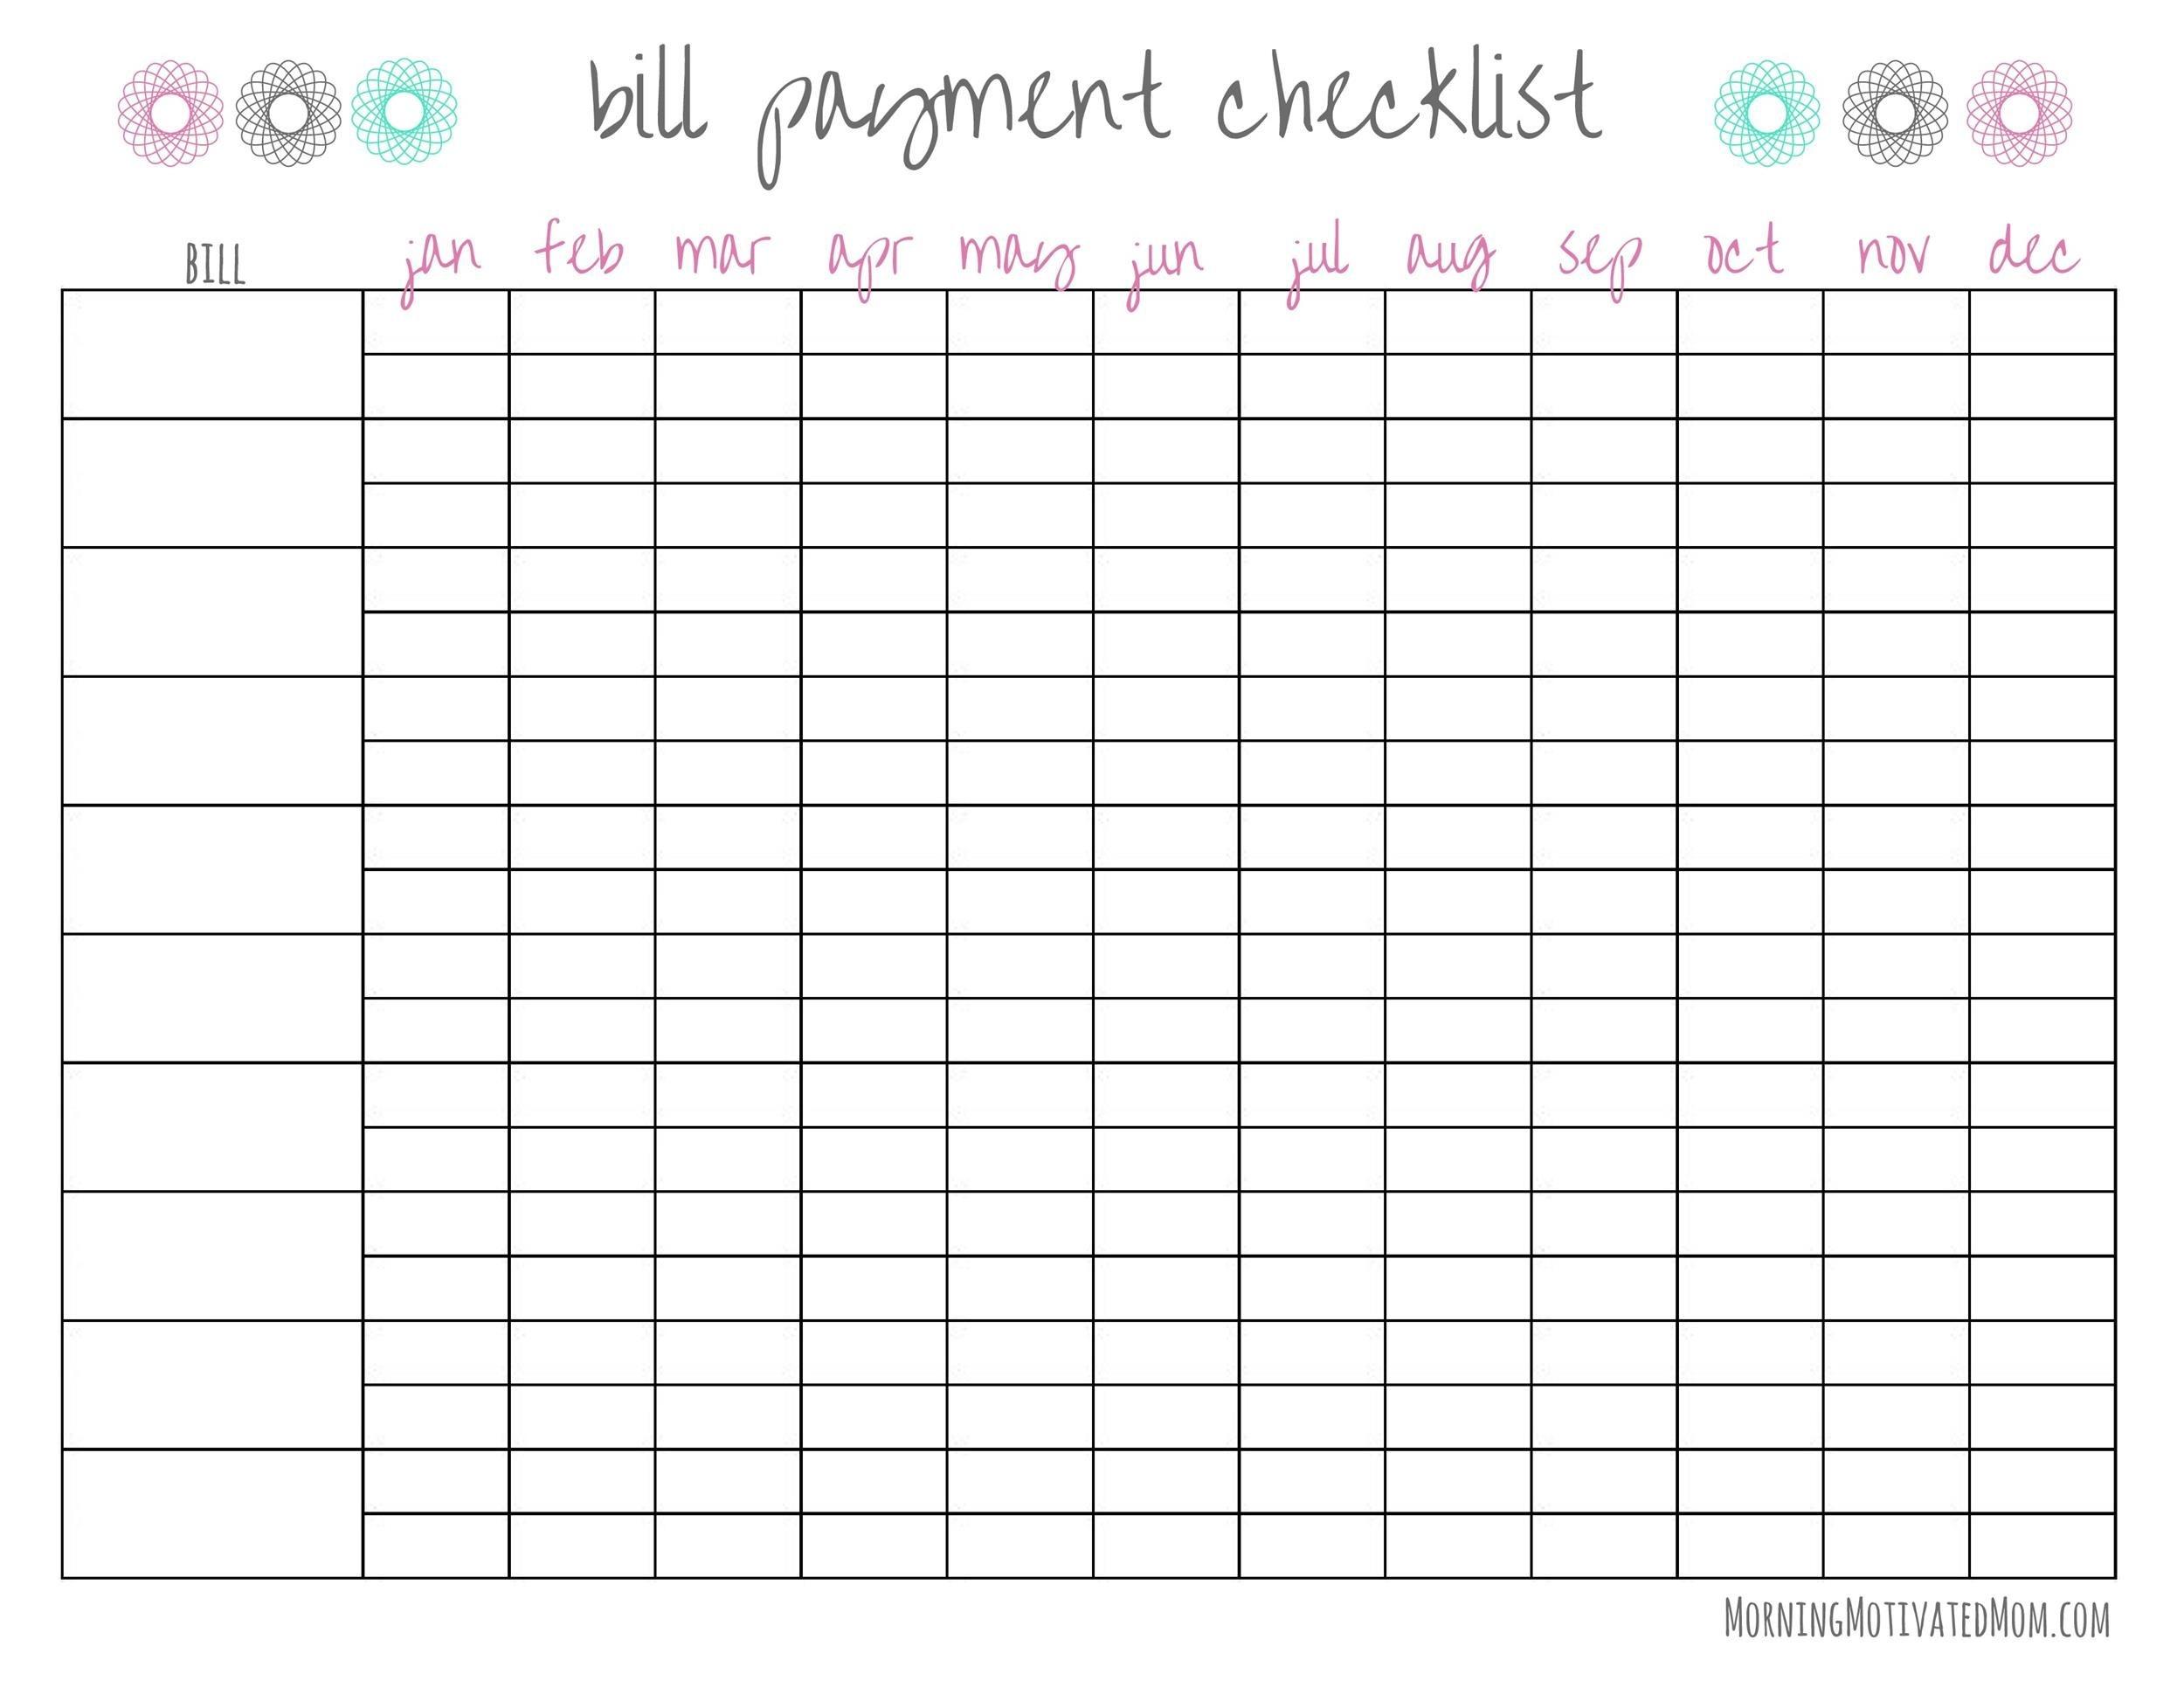 Monthly Checklist Template - Example Calendar Printable